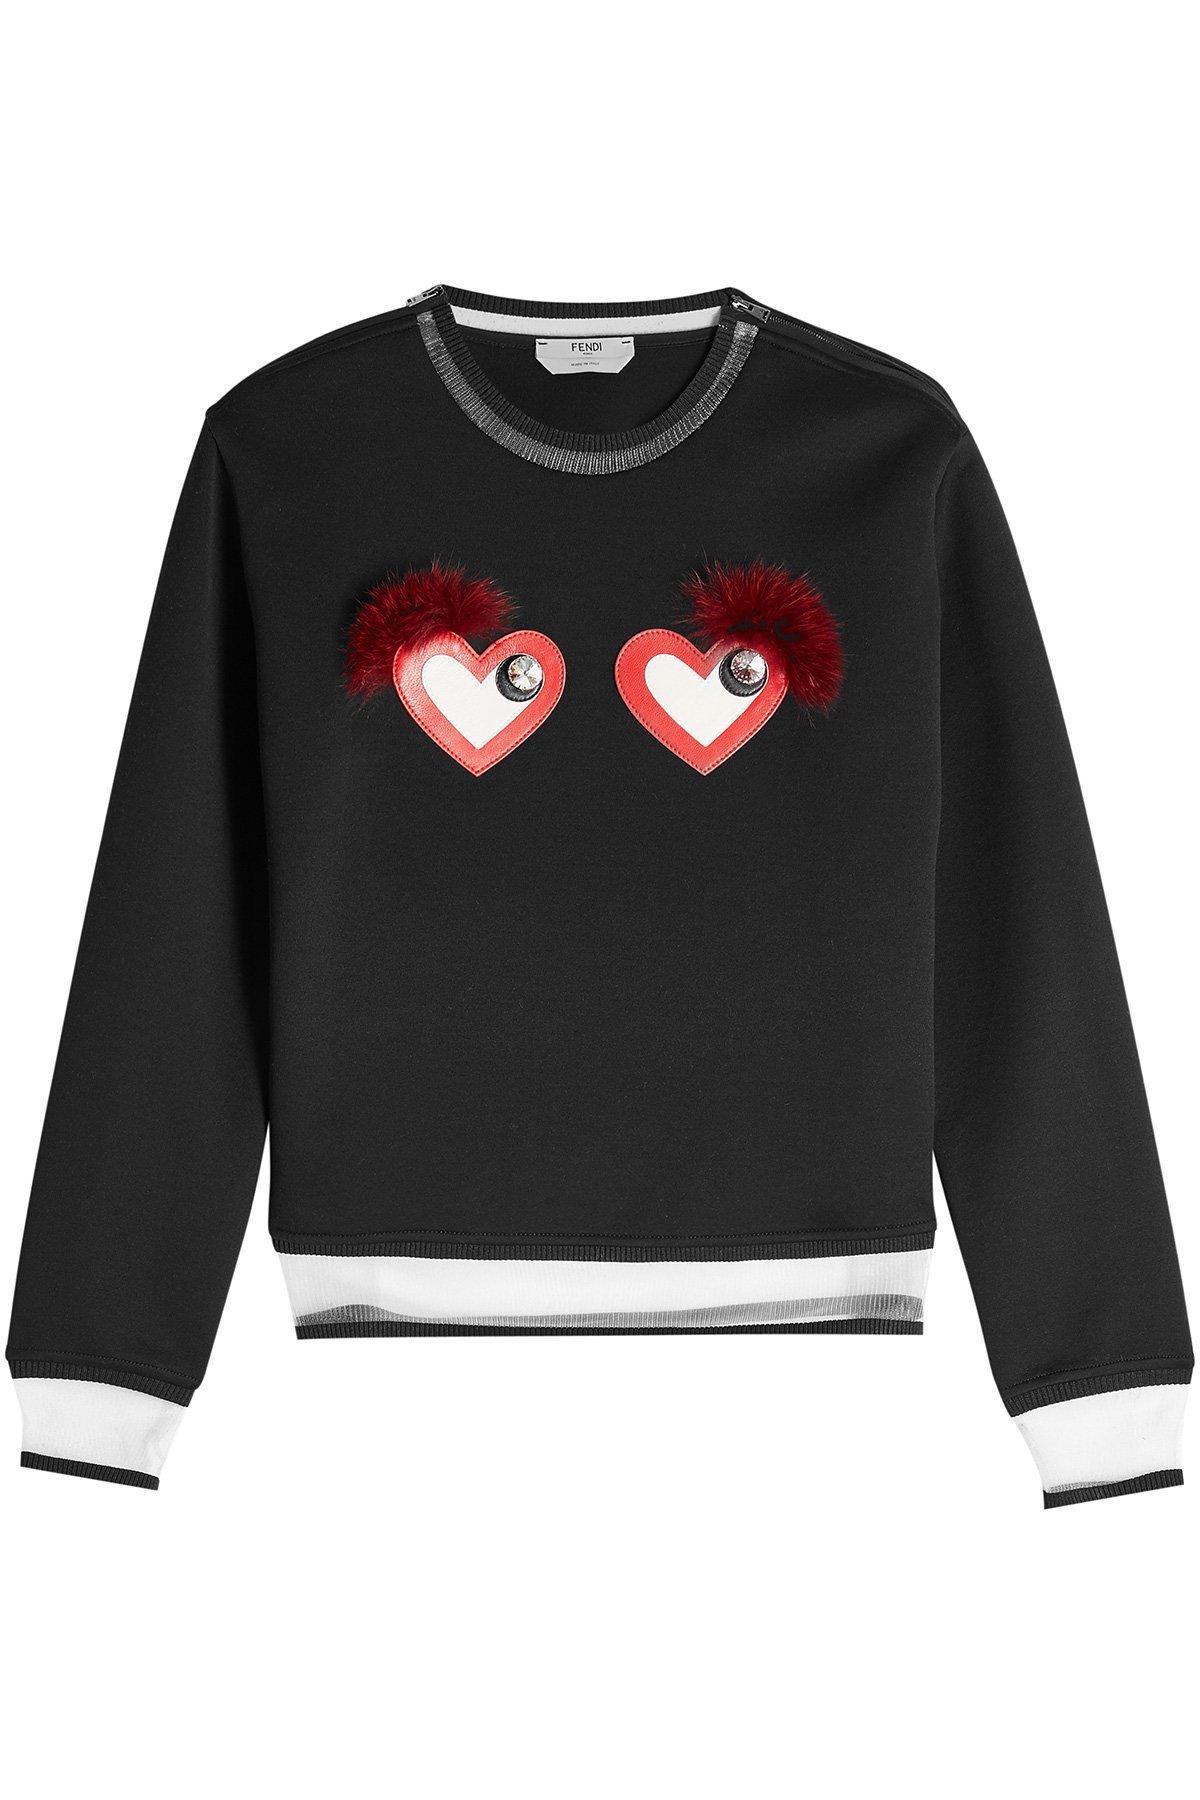 Cotton-Blend Sweatshirt with Hearts Gr. IT 44